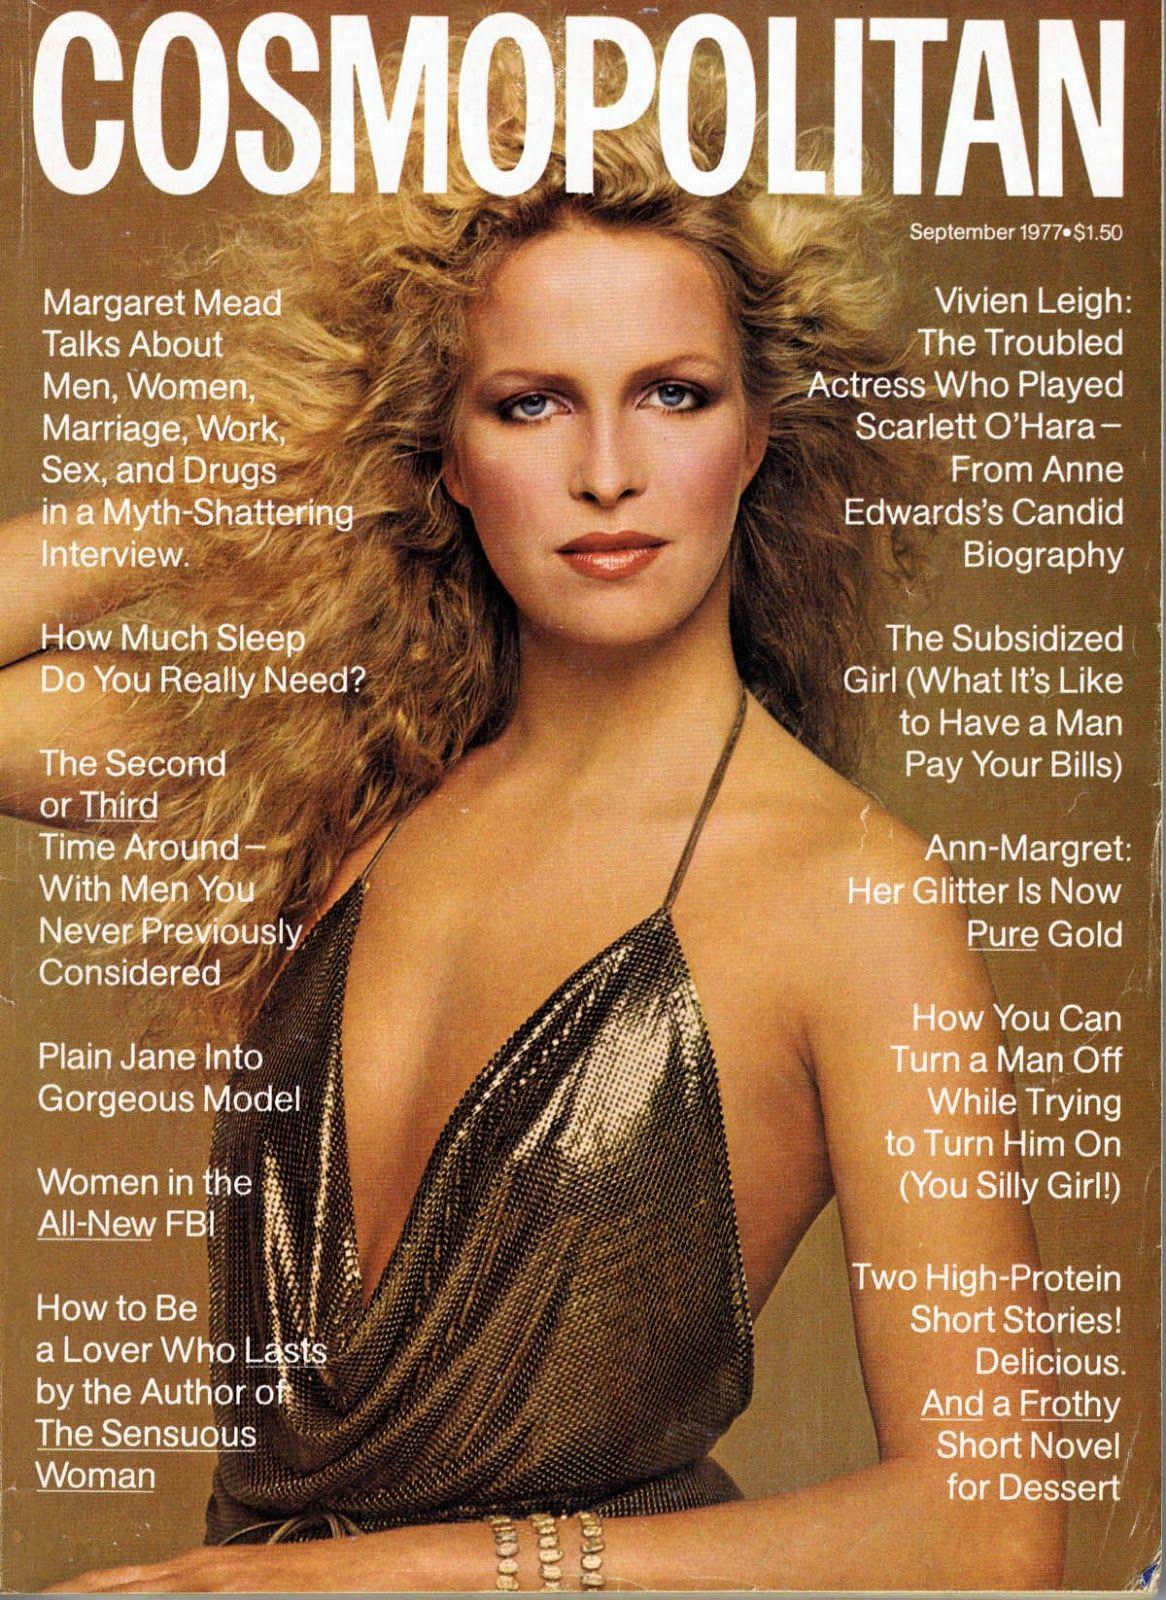 Cosmopolitan magazine, SEPTEMBER 1977 Model: Valentine Monnier Photographer: Francesco Scavullo